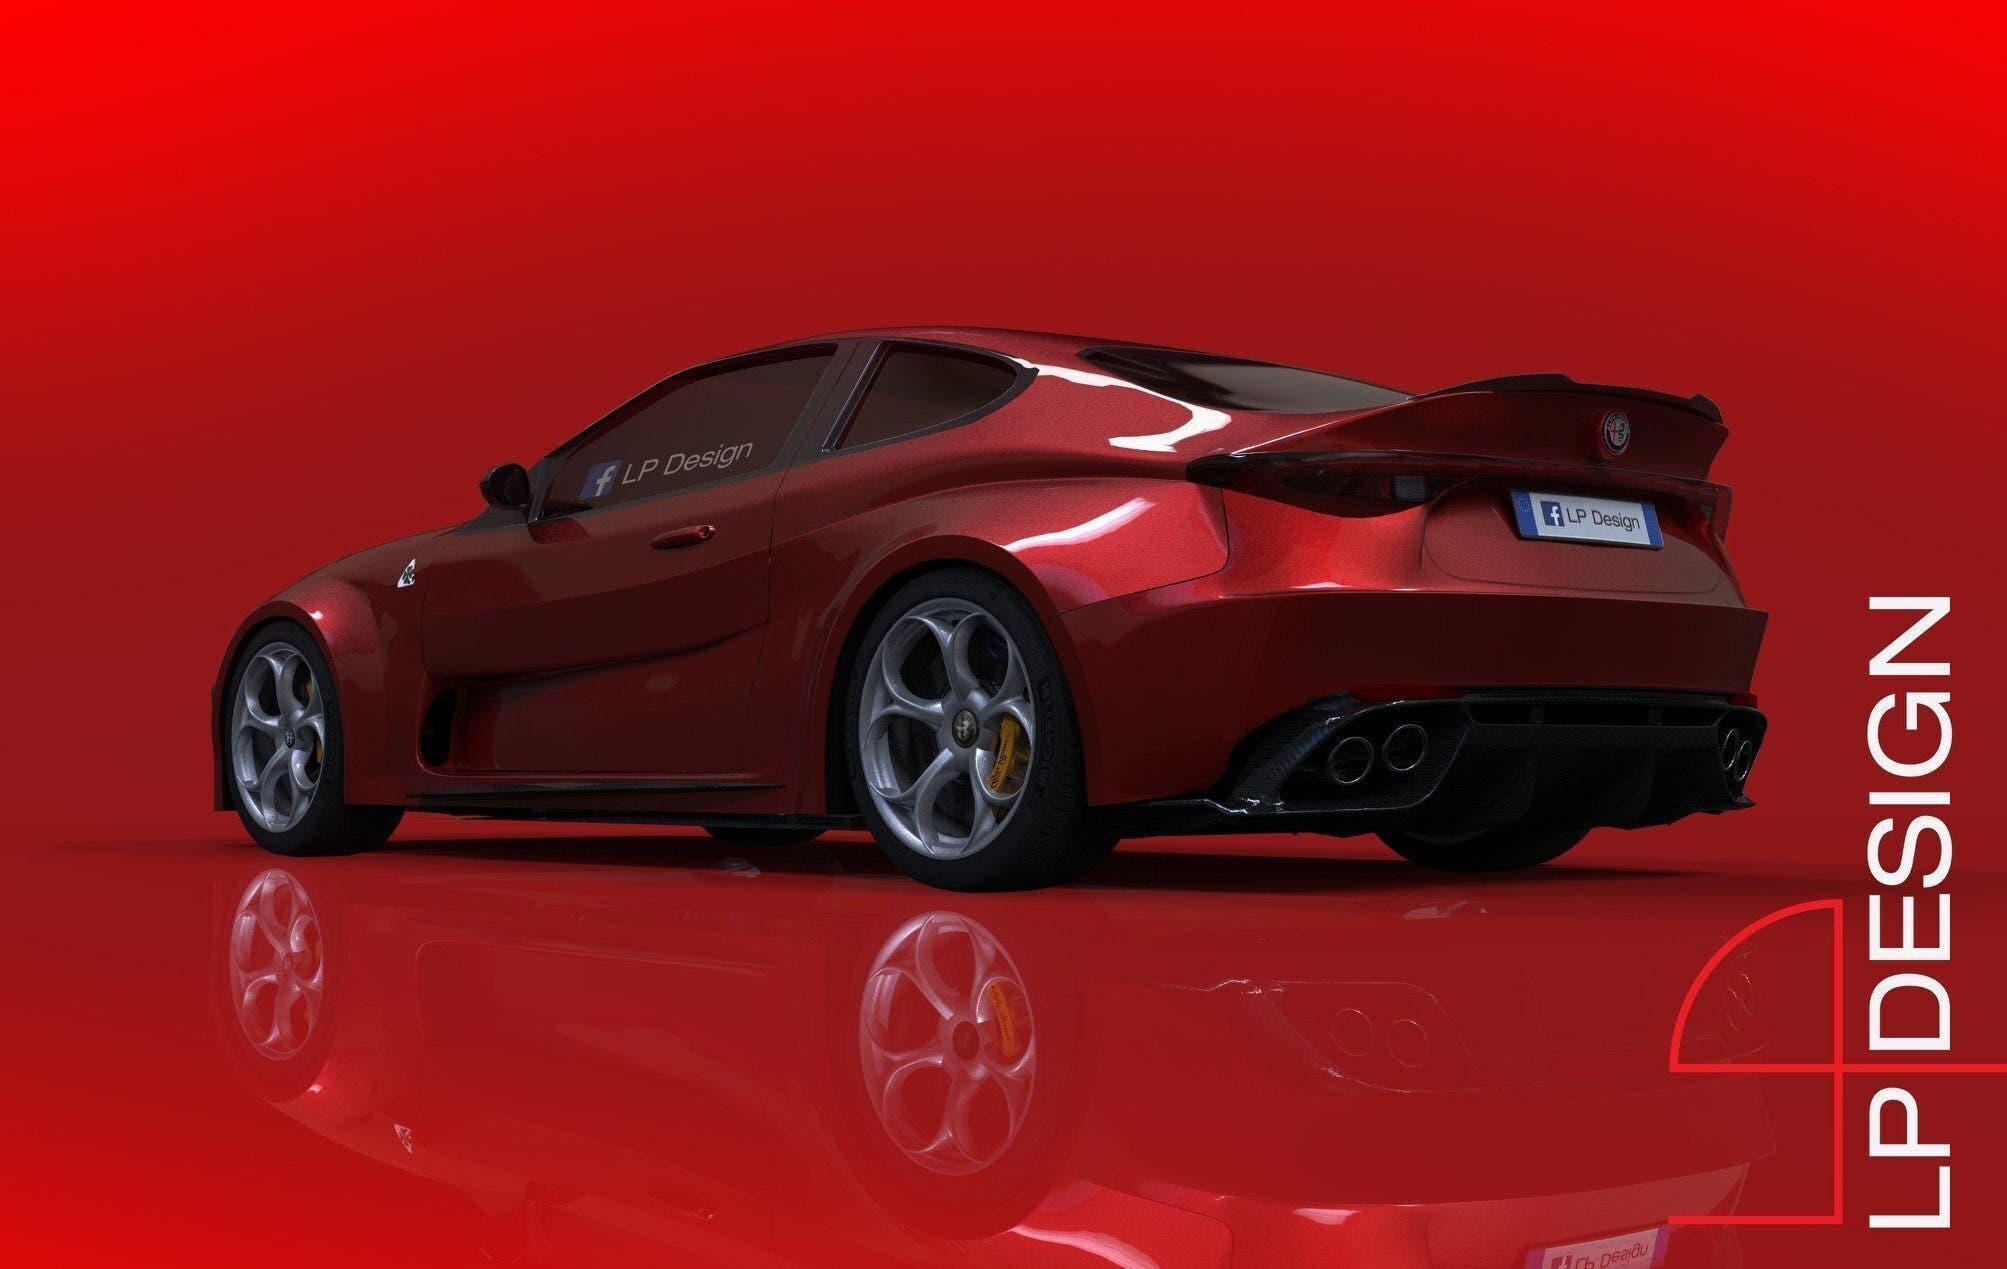 Alfa Romeo GTV LP Design nuovo render